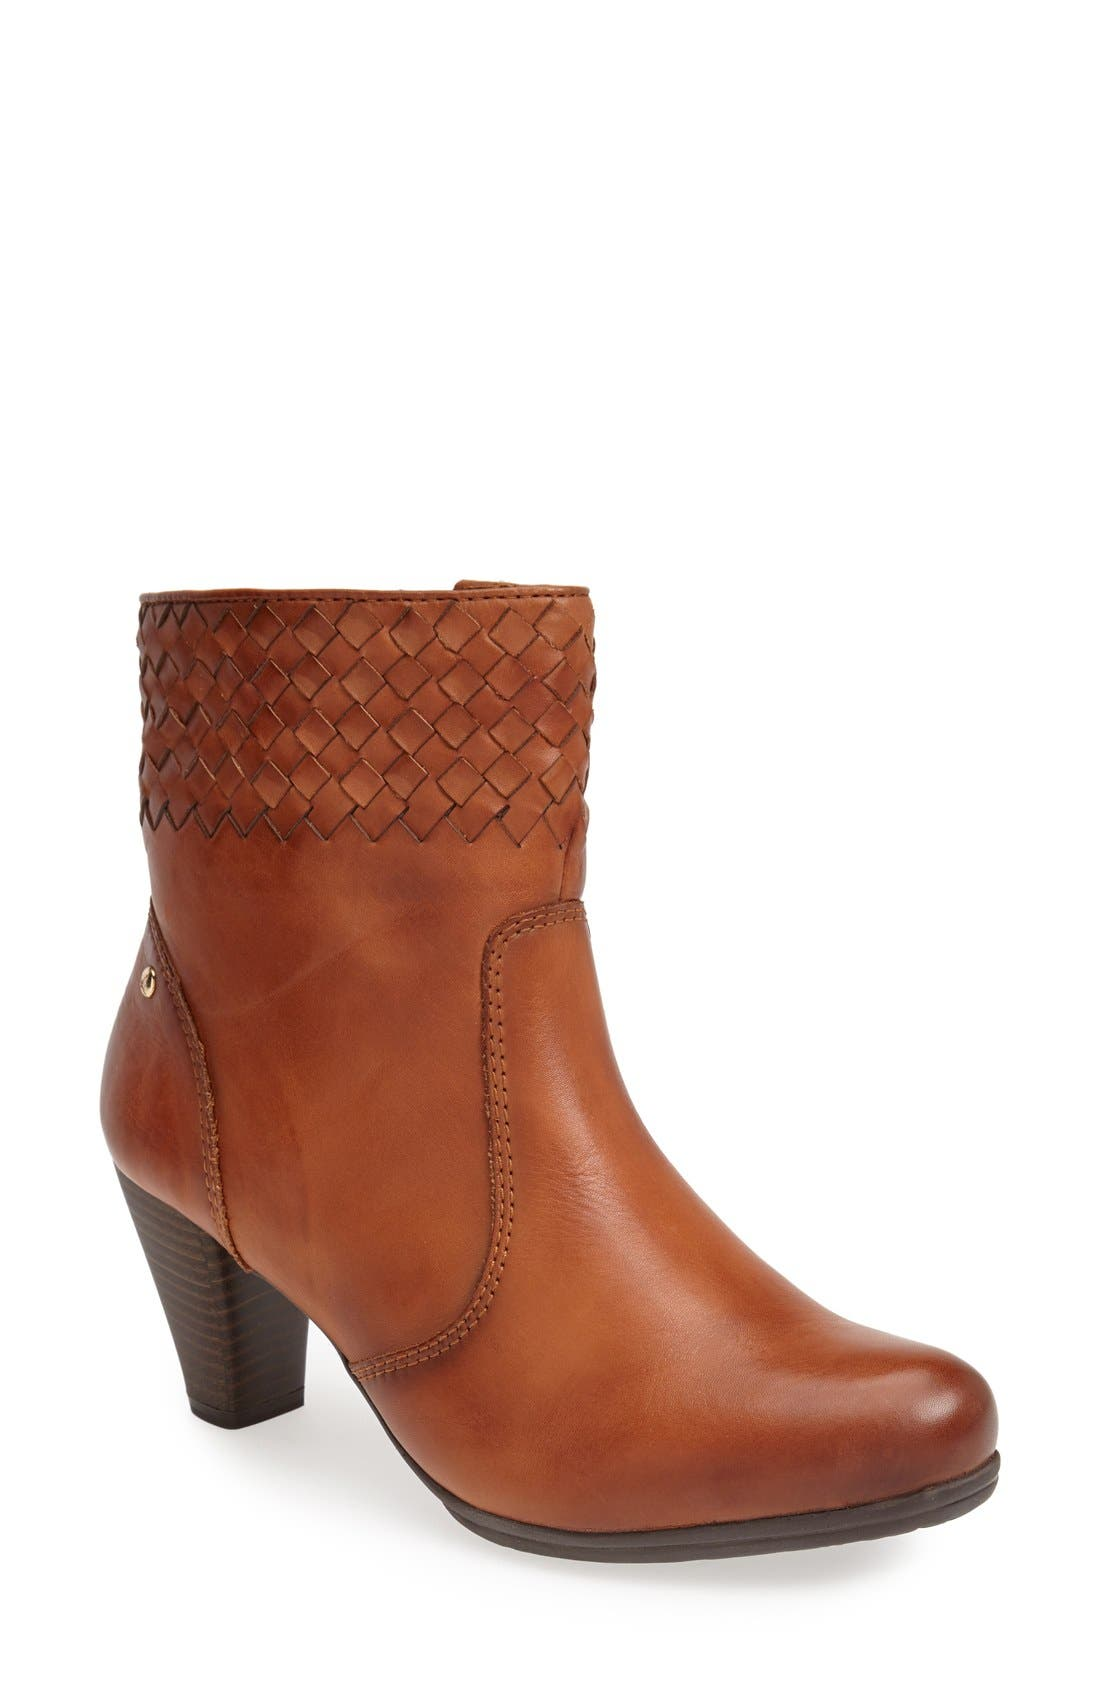 Main Image - PIKOLINOS 'Verona' Short Boot (Women)